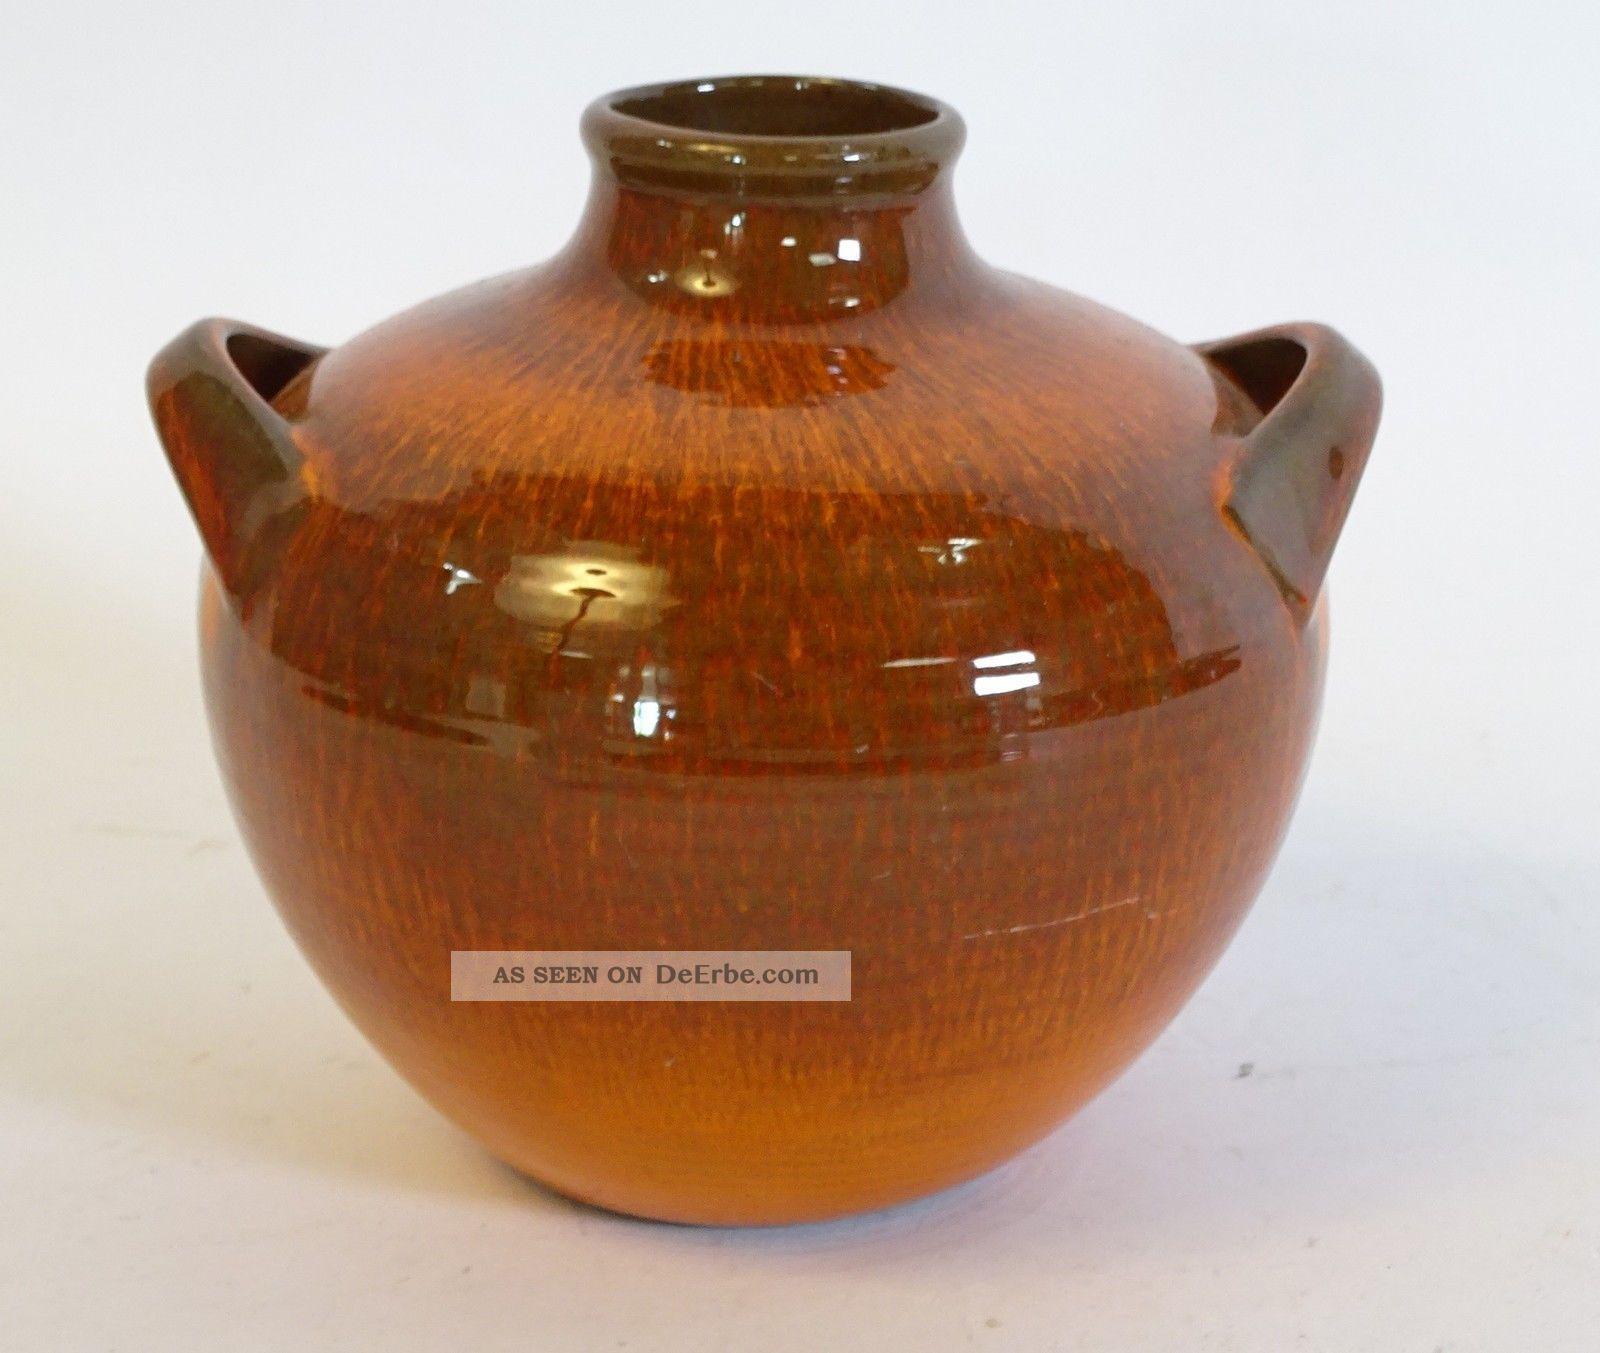 70er Jahre Panton Ära Herrliche Laufglasur Keramik Vase Topf Top Design Objekt 1970-1979 Bild